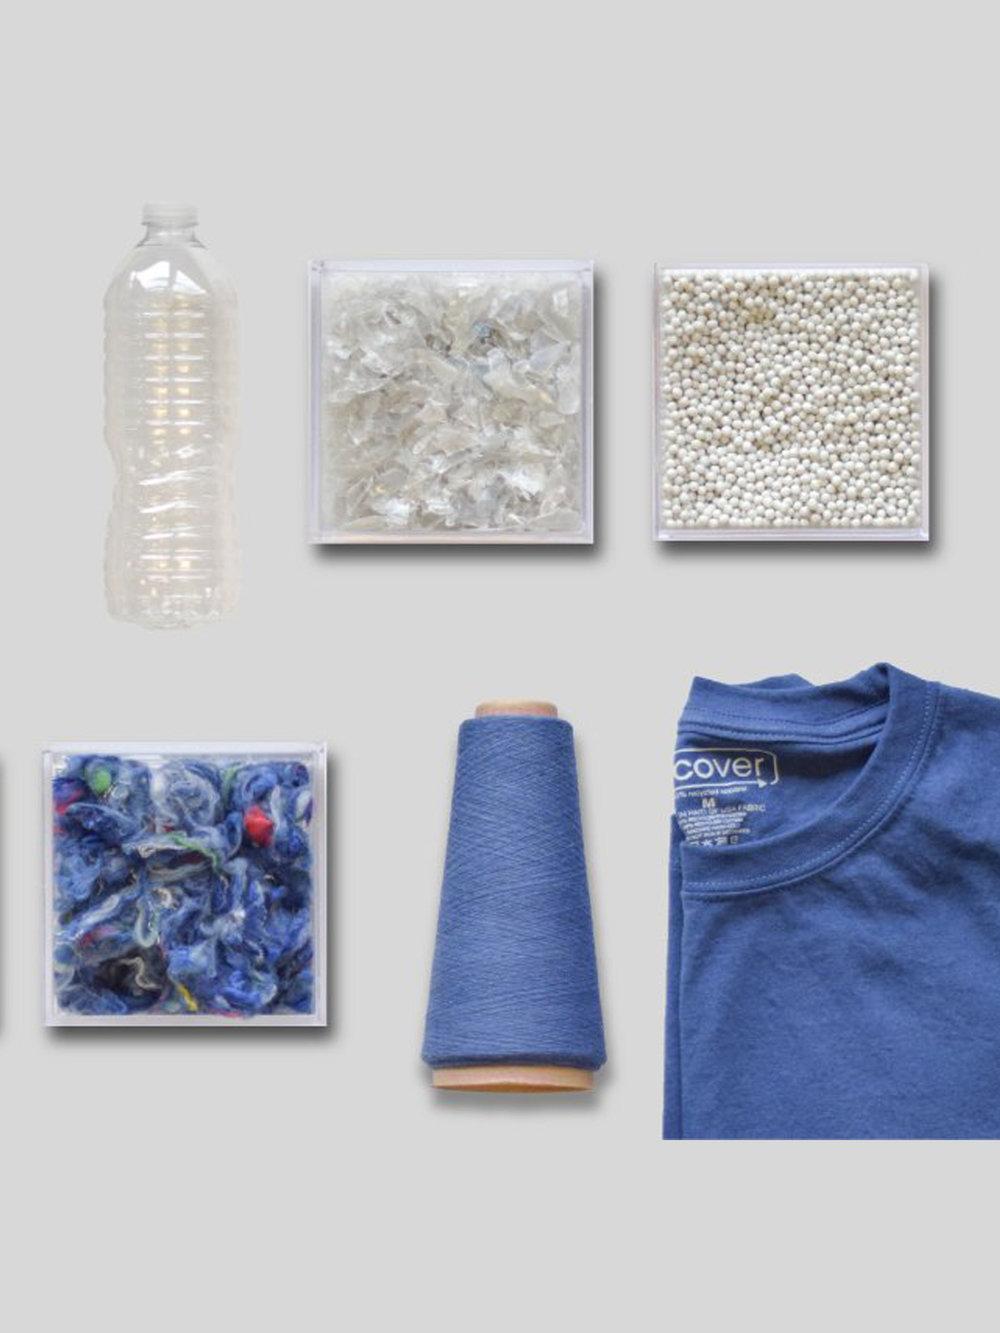 apdat-print-co-recover-tees-recycled-shirt.jpg